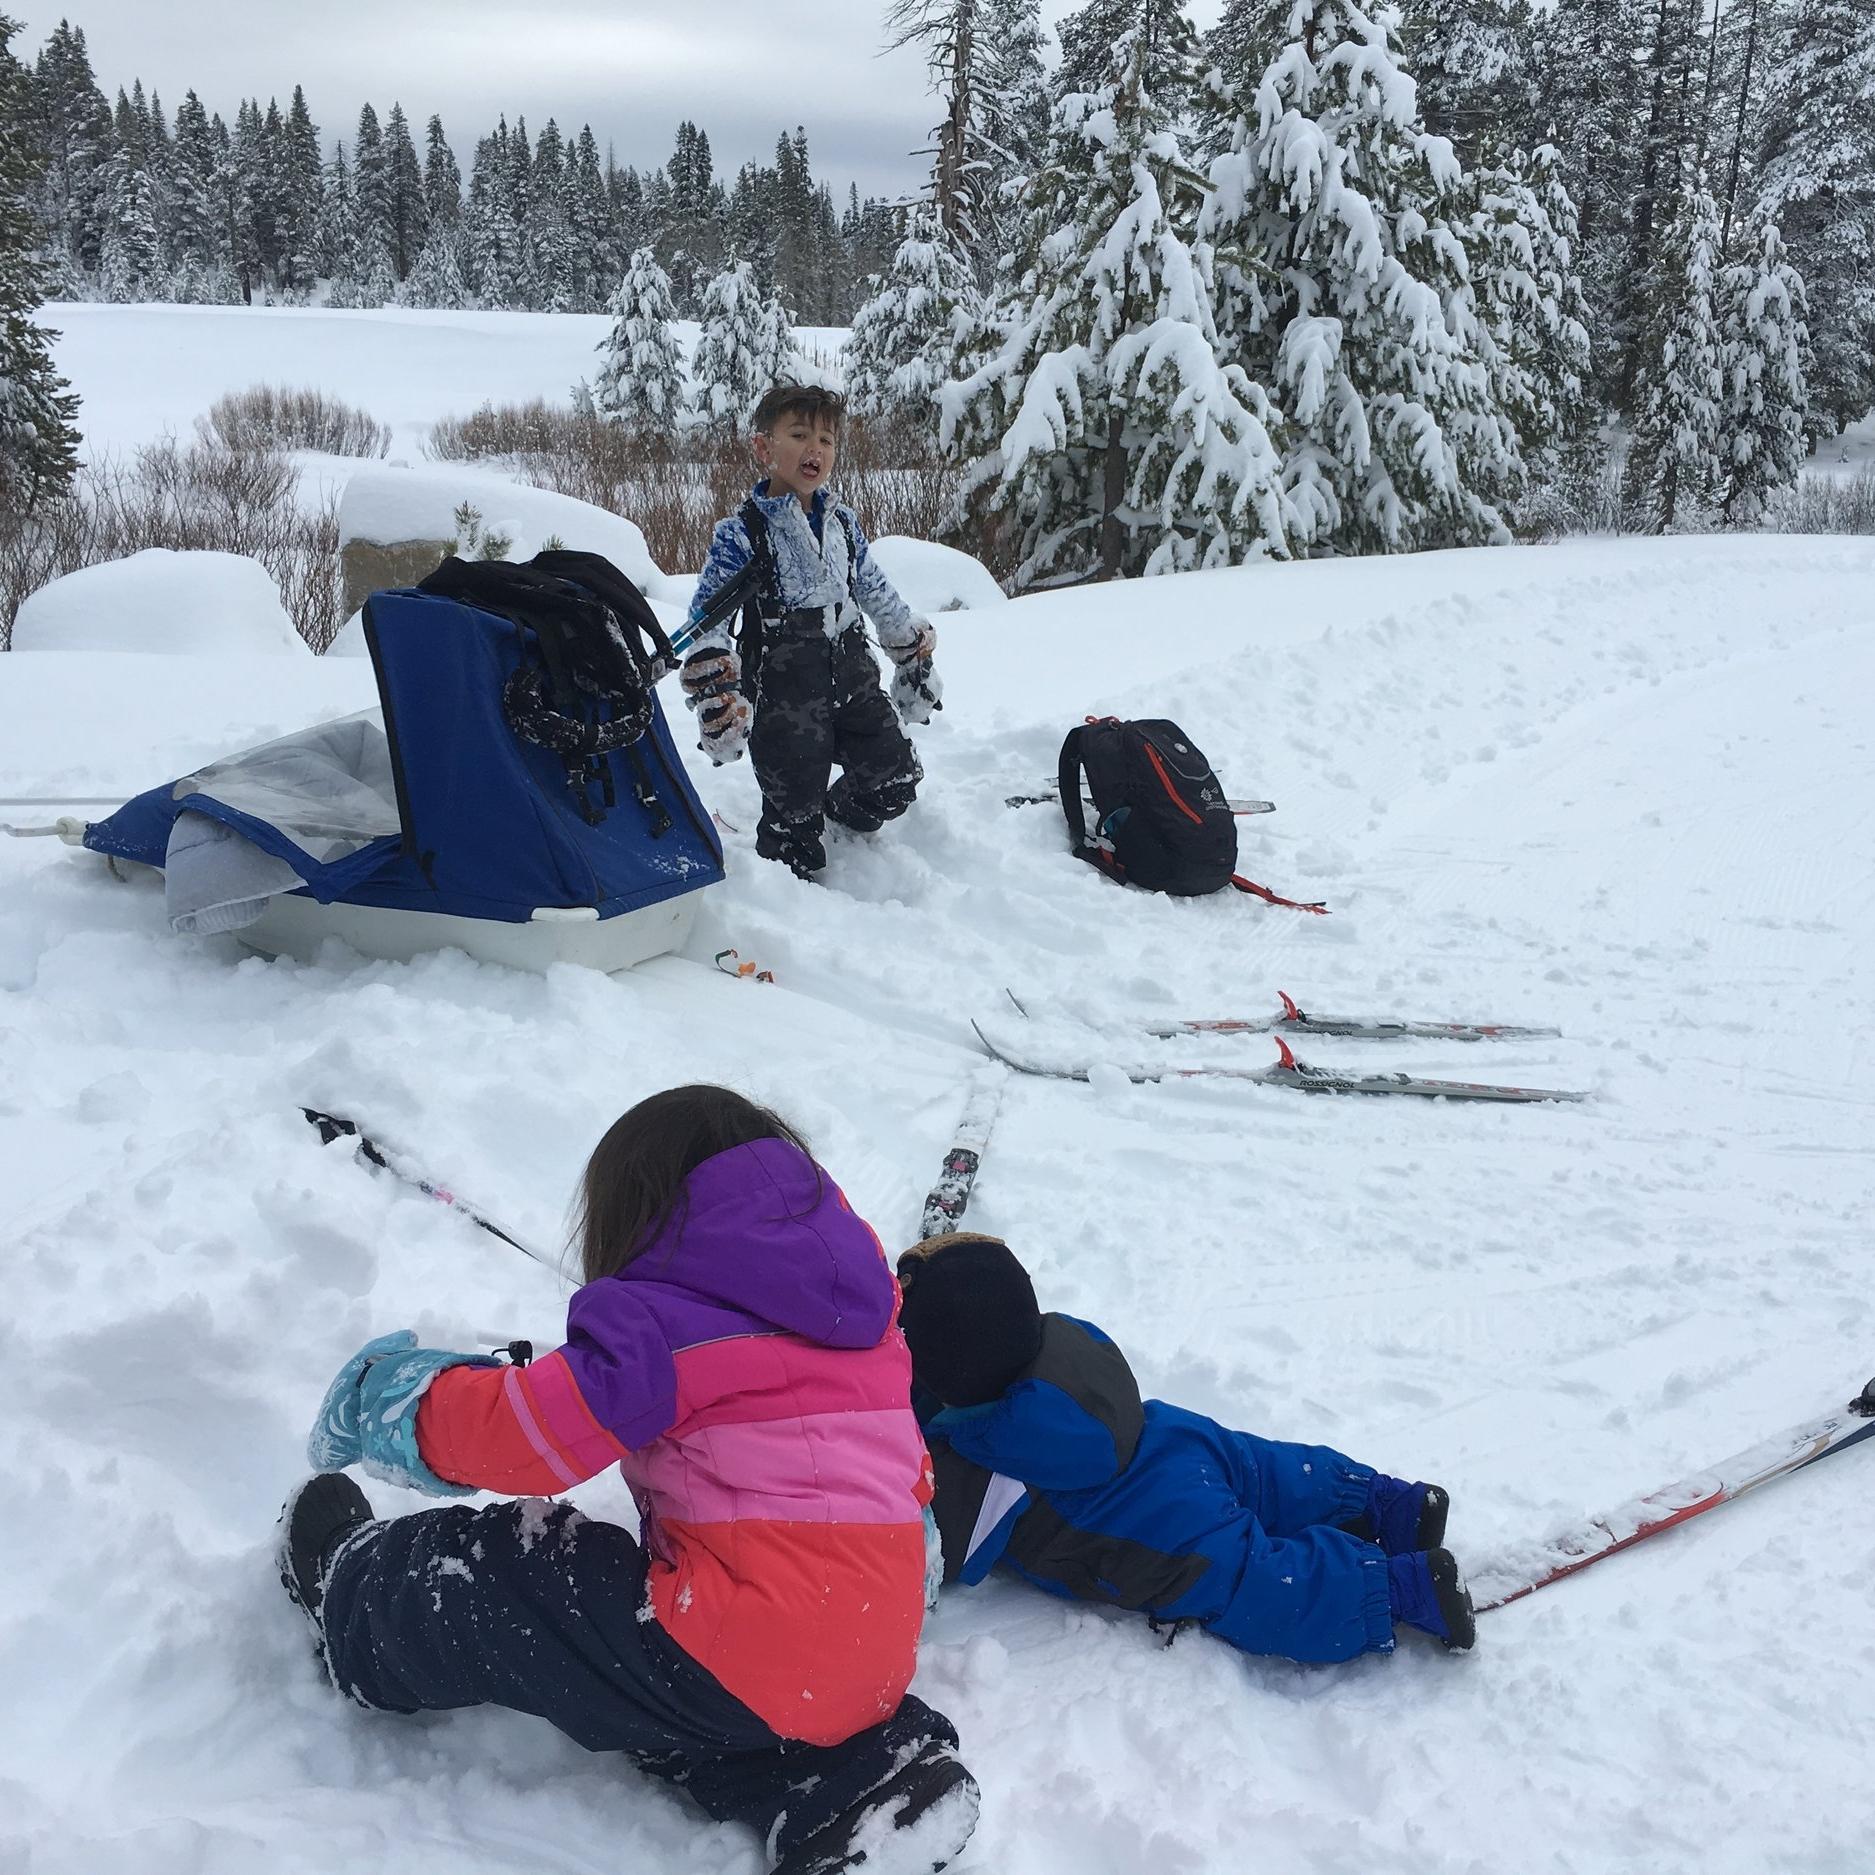 SNOW!!! My poor snow-deprived children.